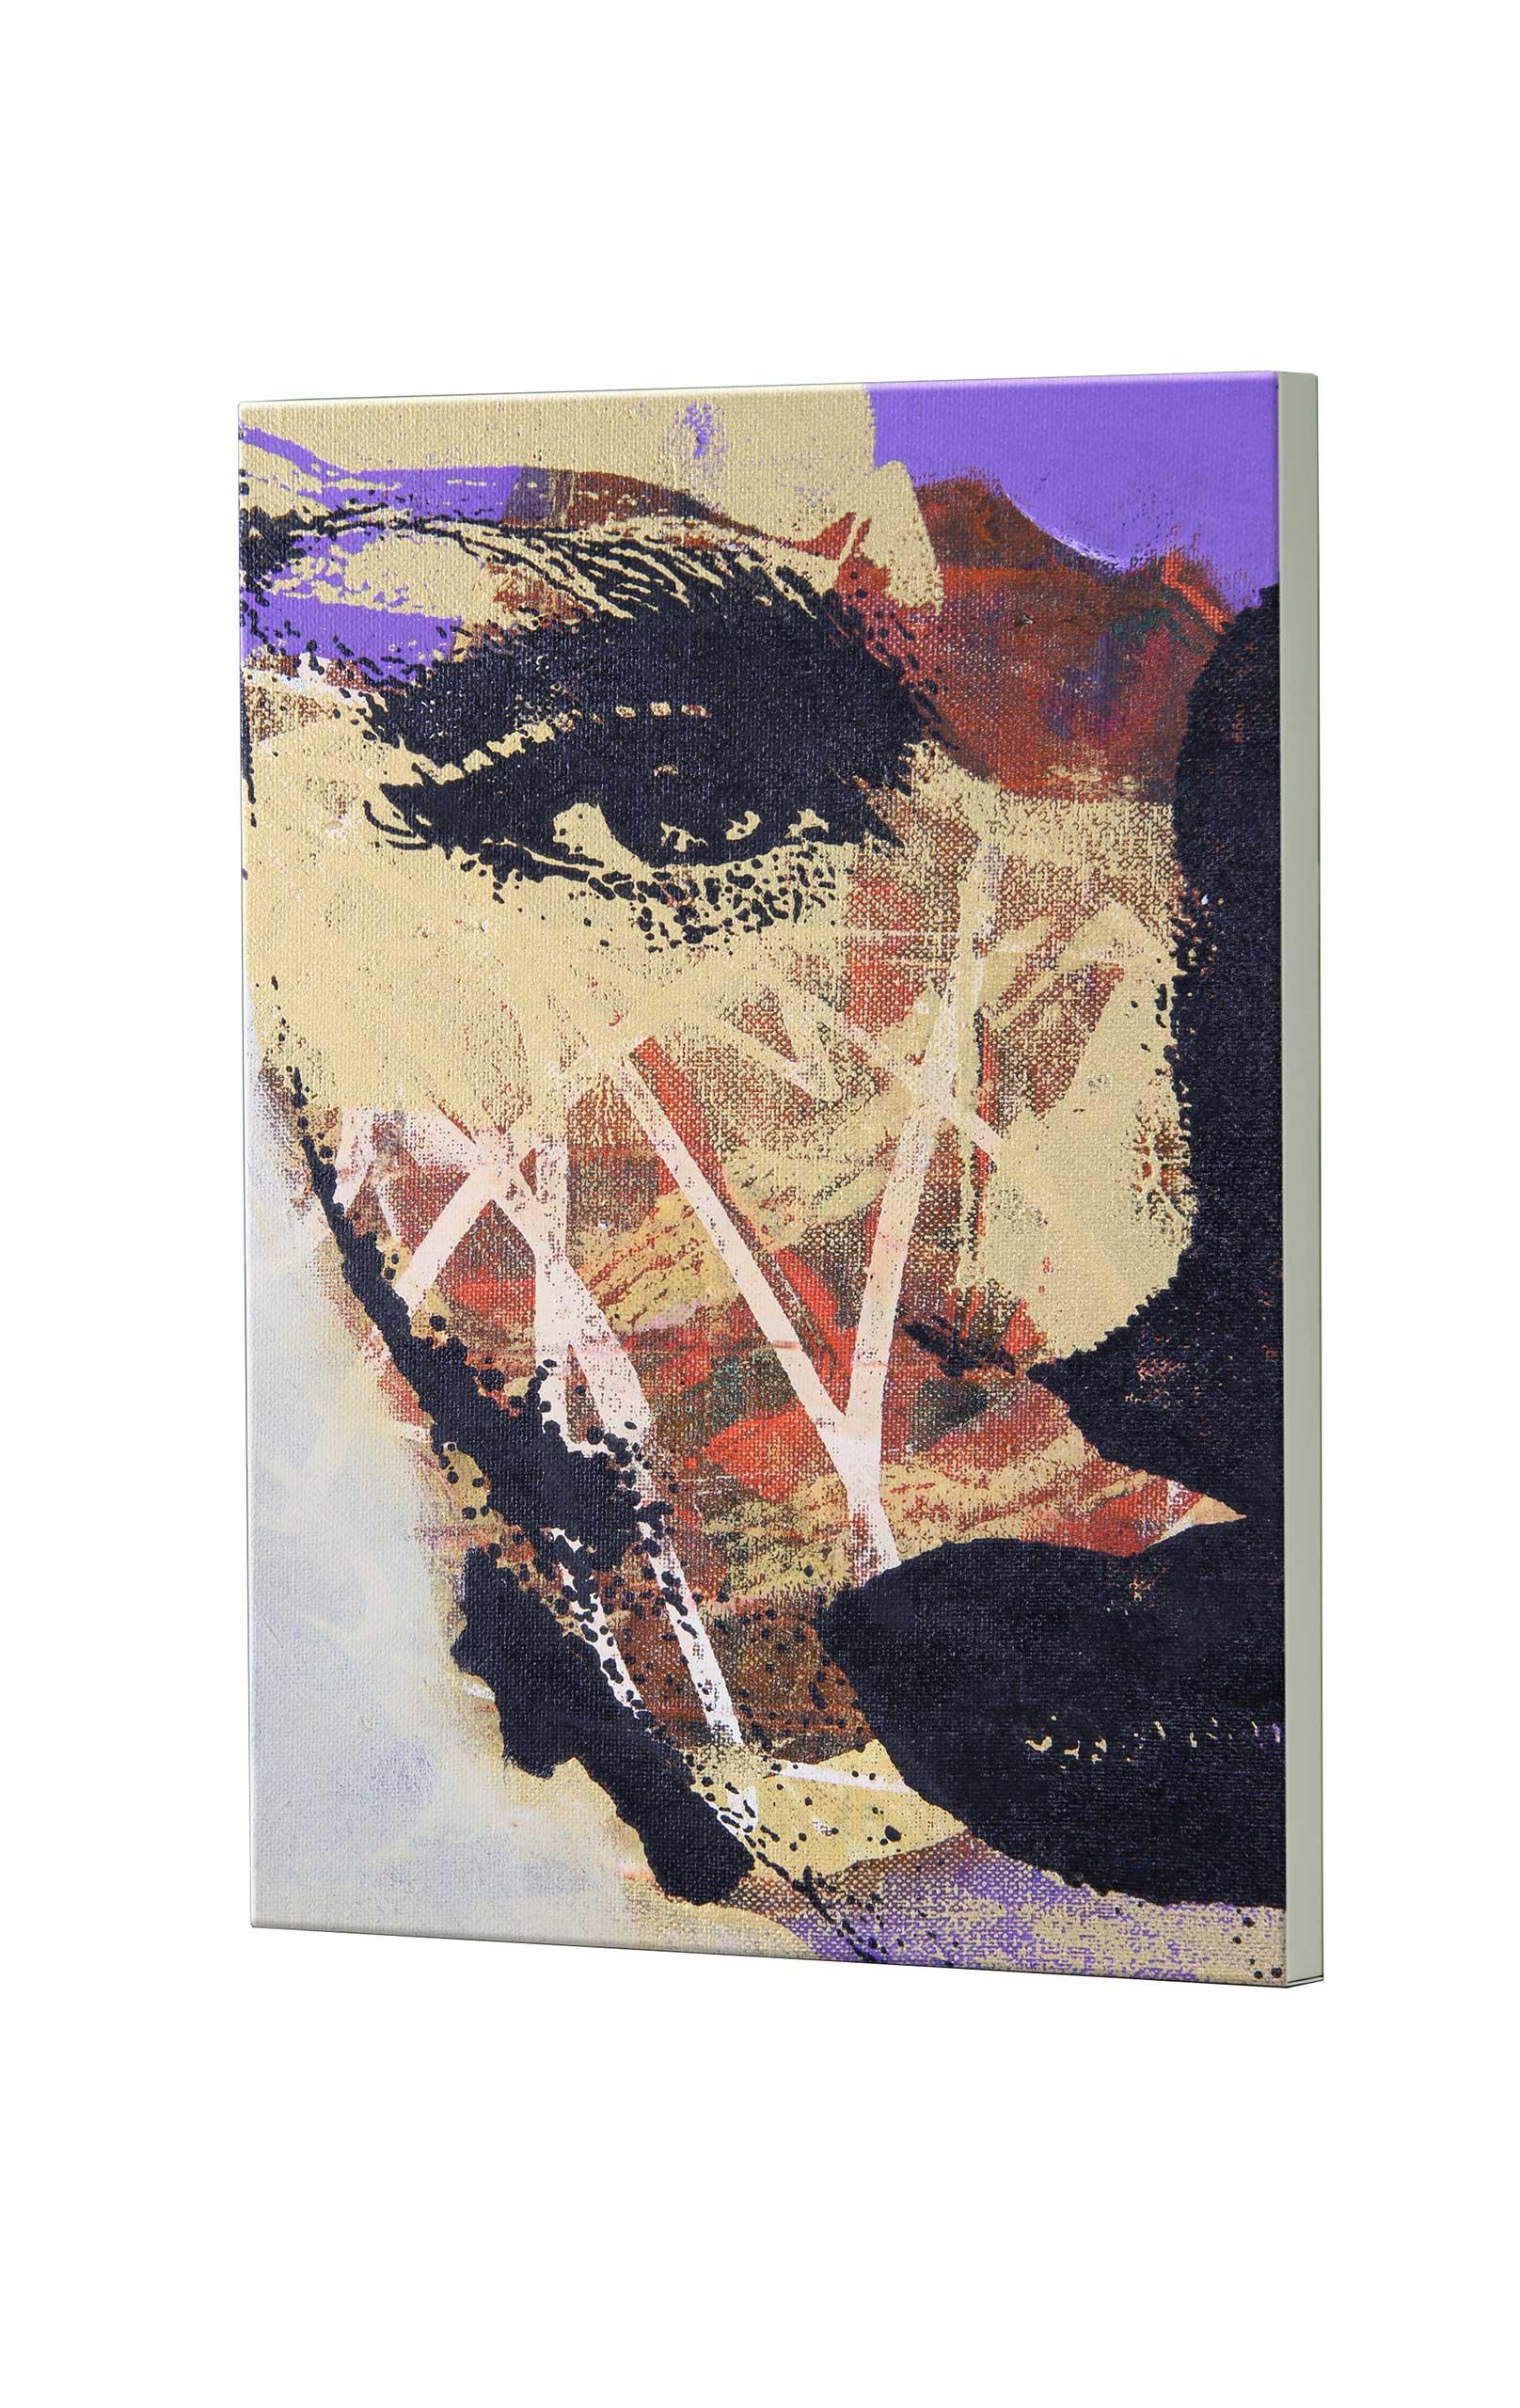 Magnettafel NOTIZ 60x80cm Motiv Gemälde Kunst MDH111 Motiv-Pinnwand